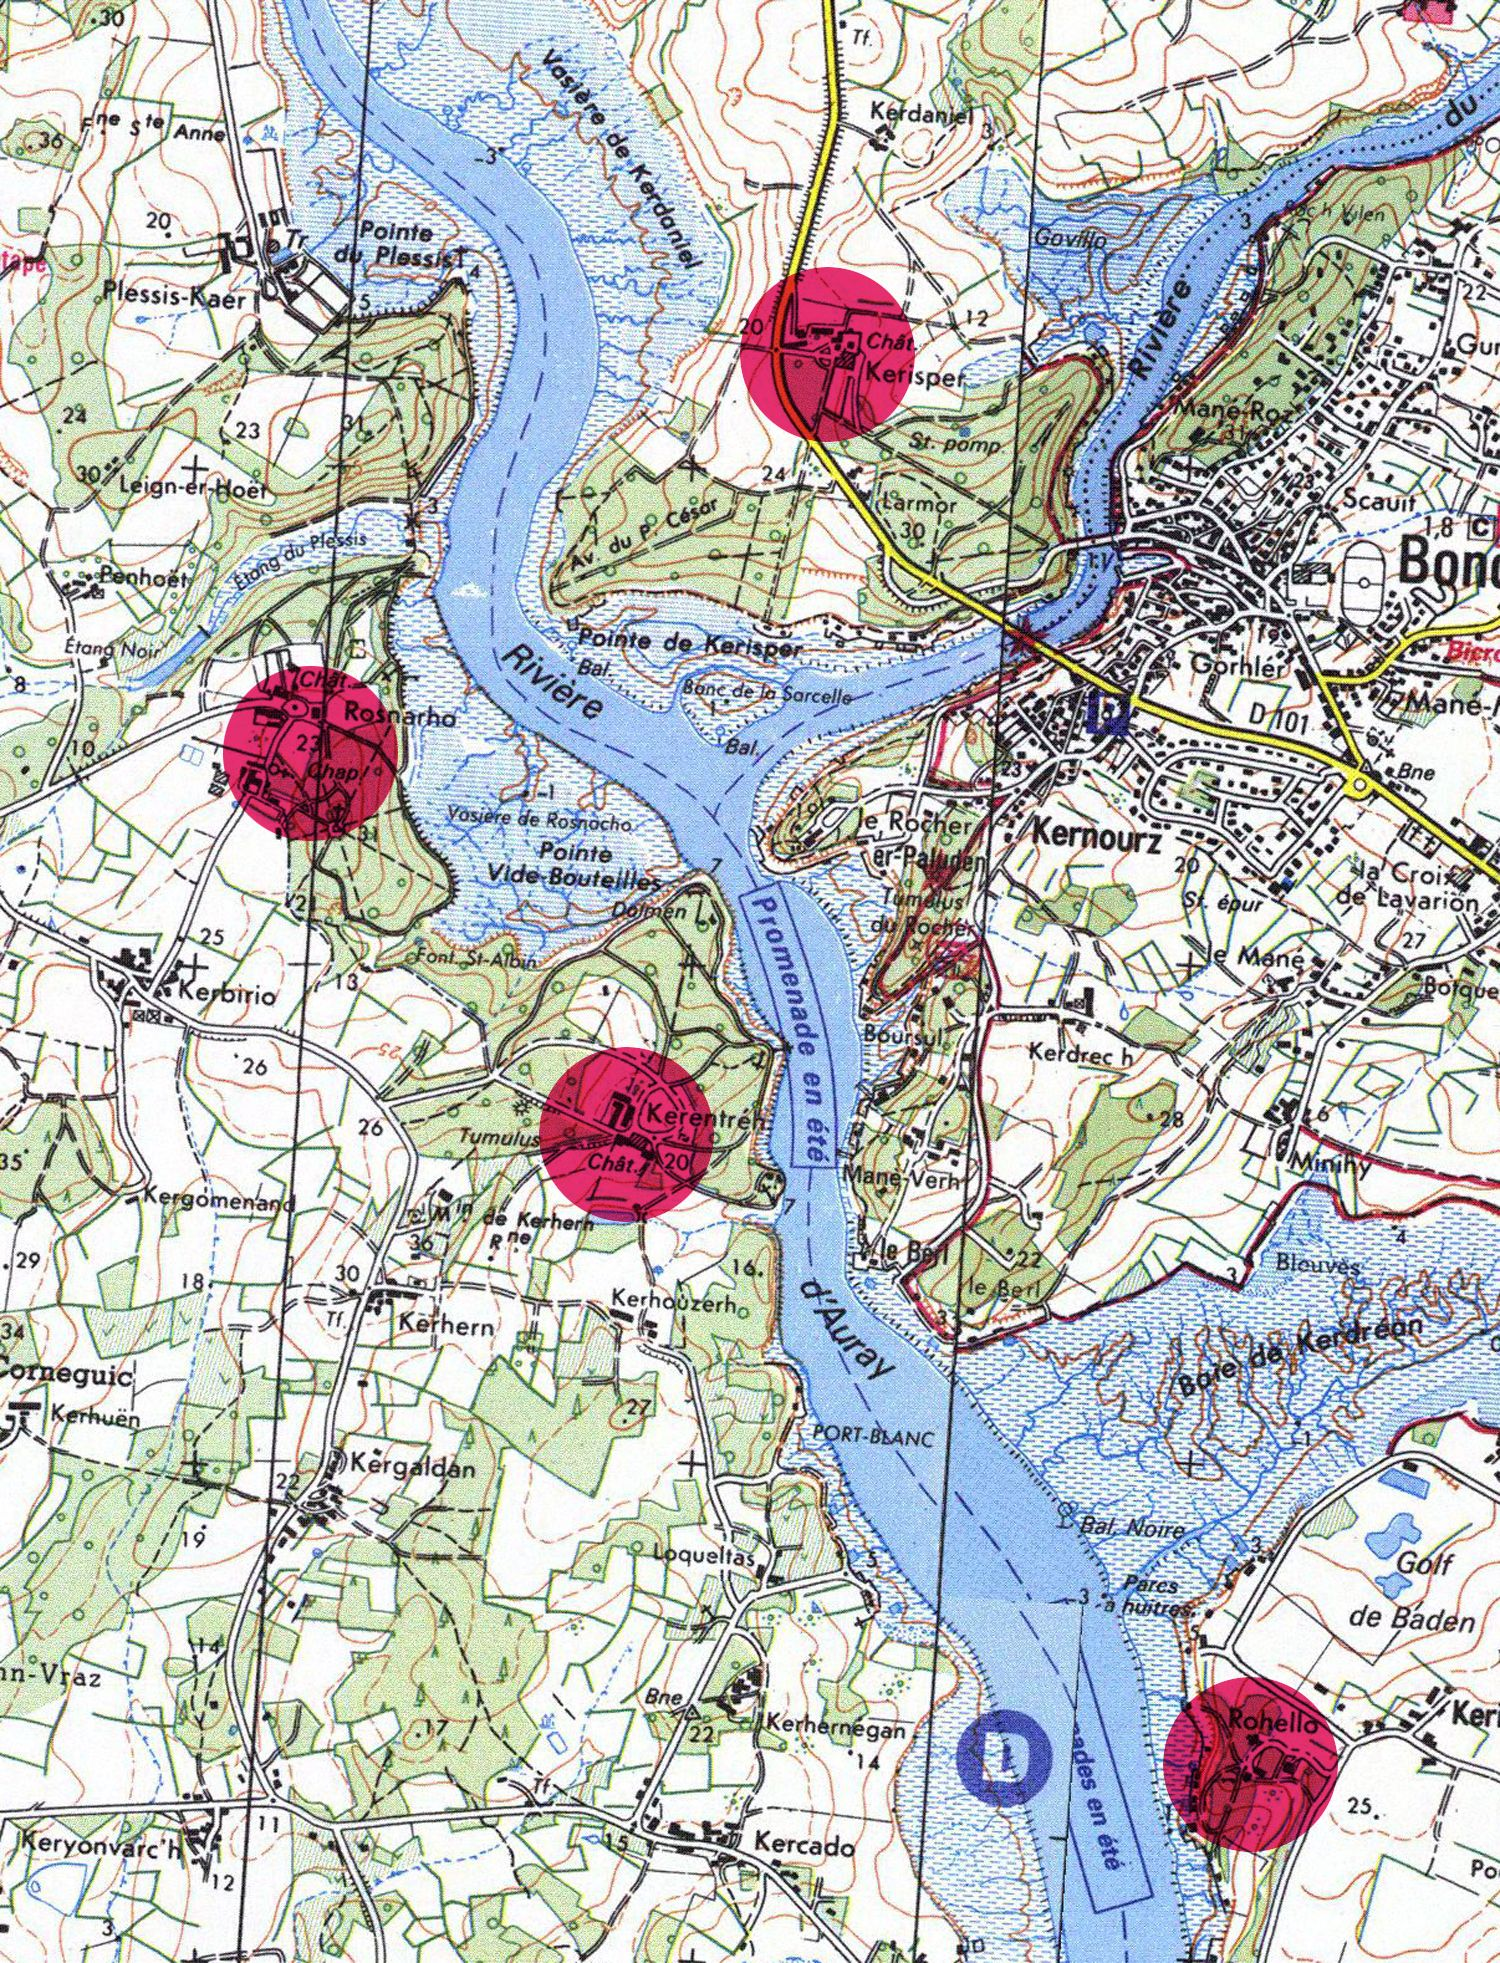 Carte De La Riviere D Auray Montrant Le Port Du Bono Le Bono Morbihan Golfe Du Morbihan